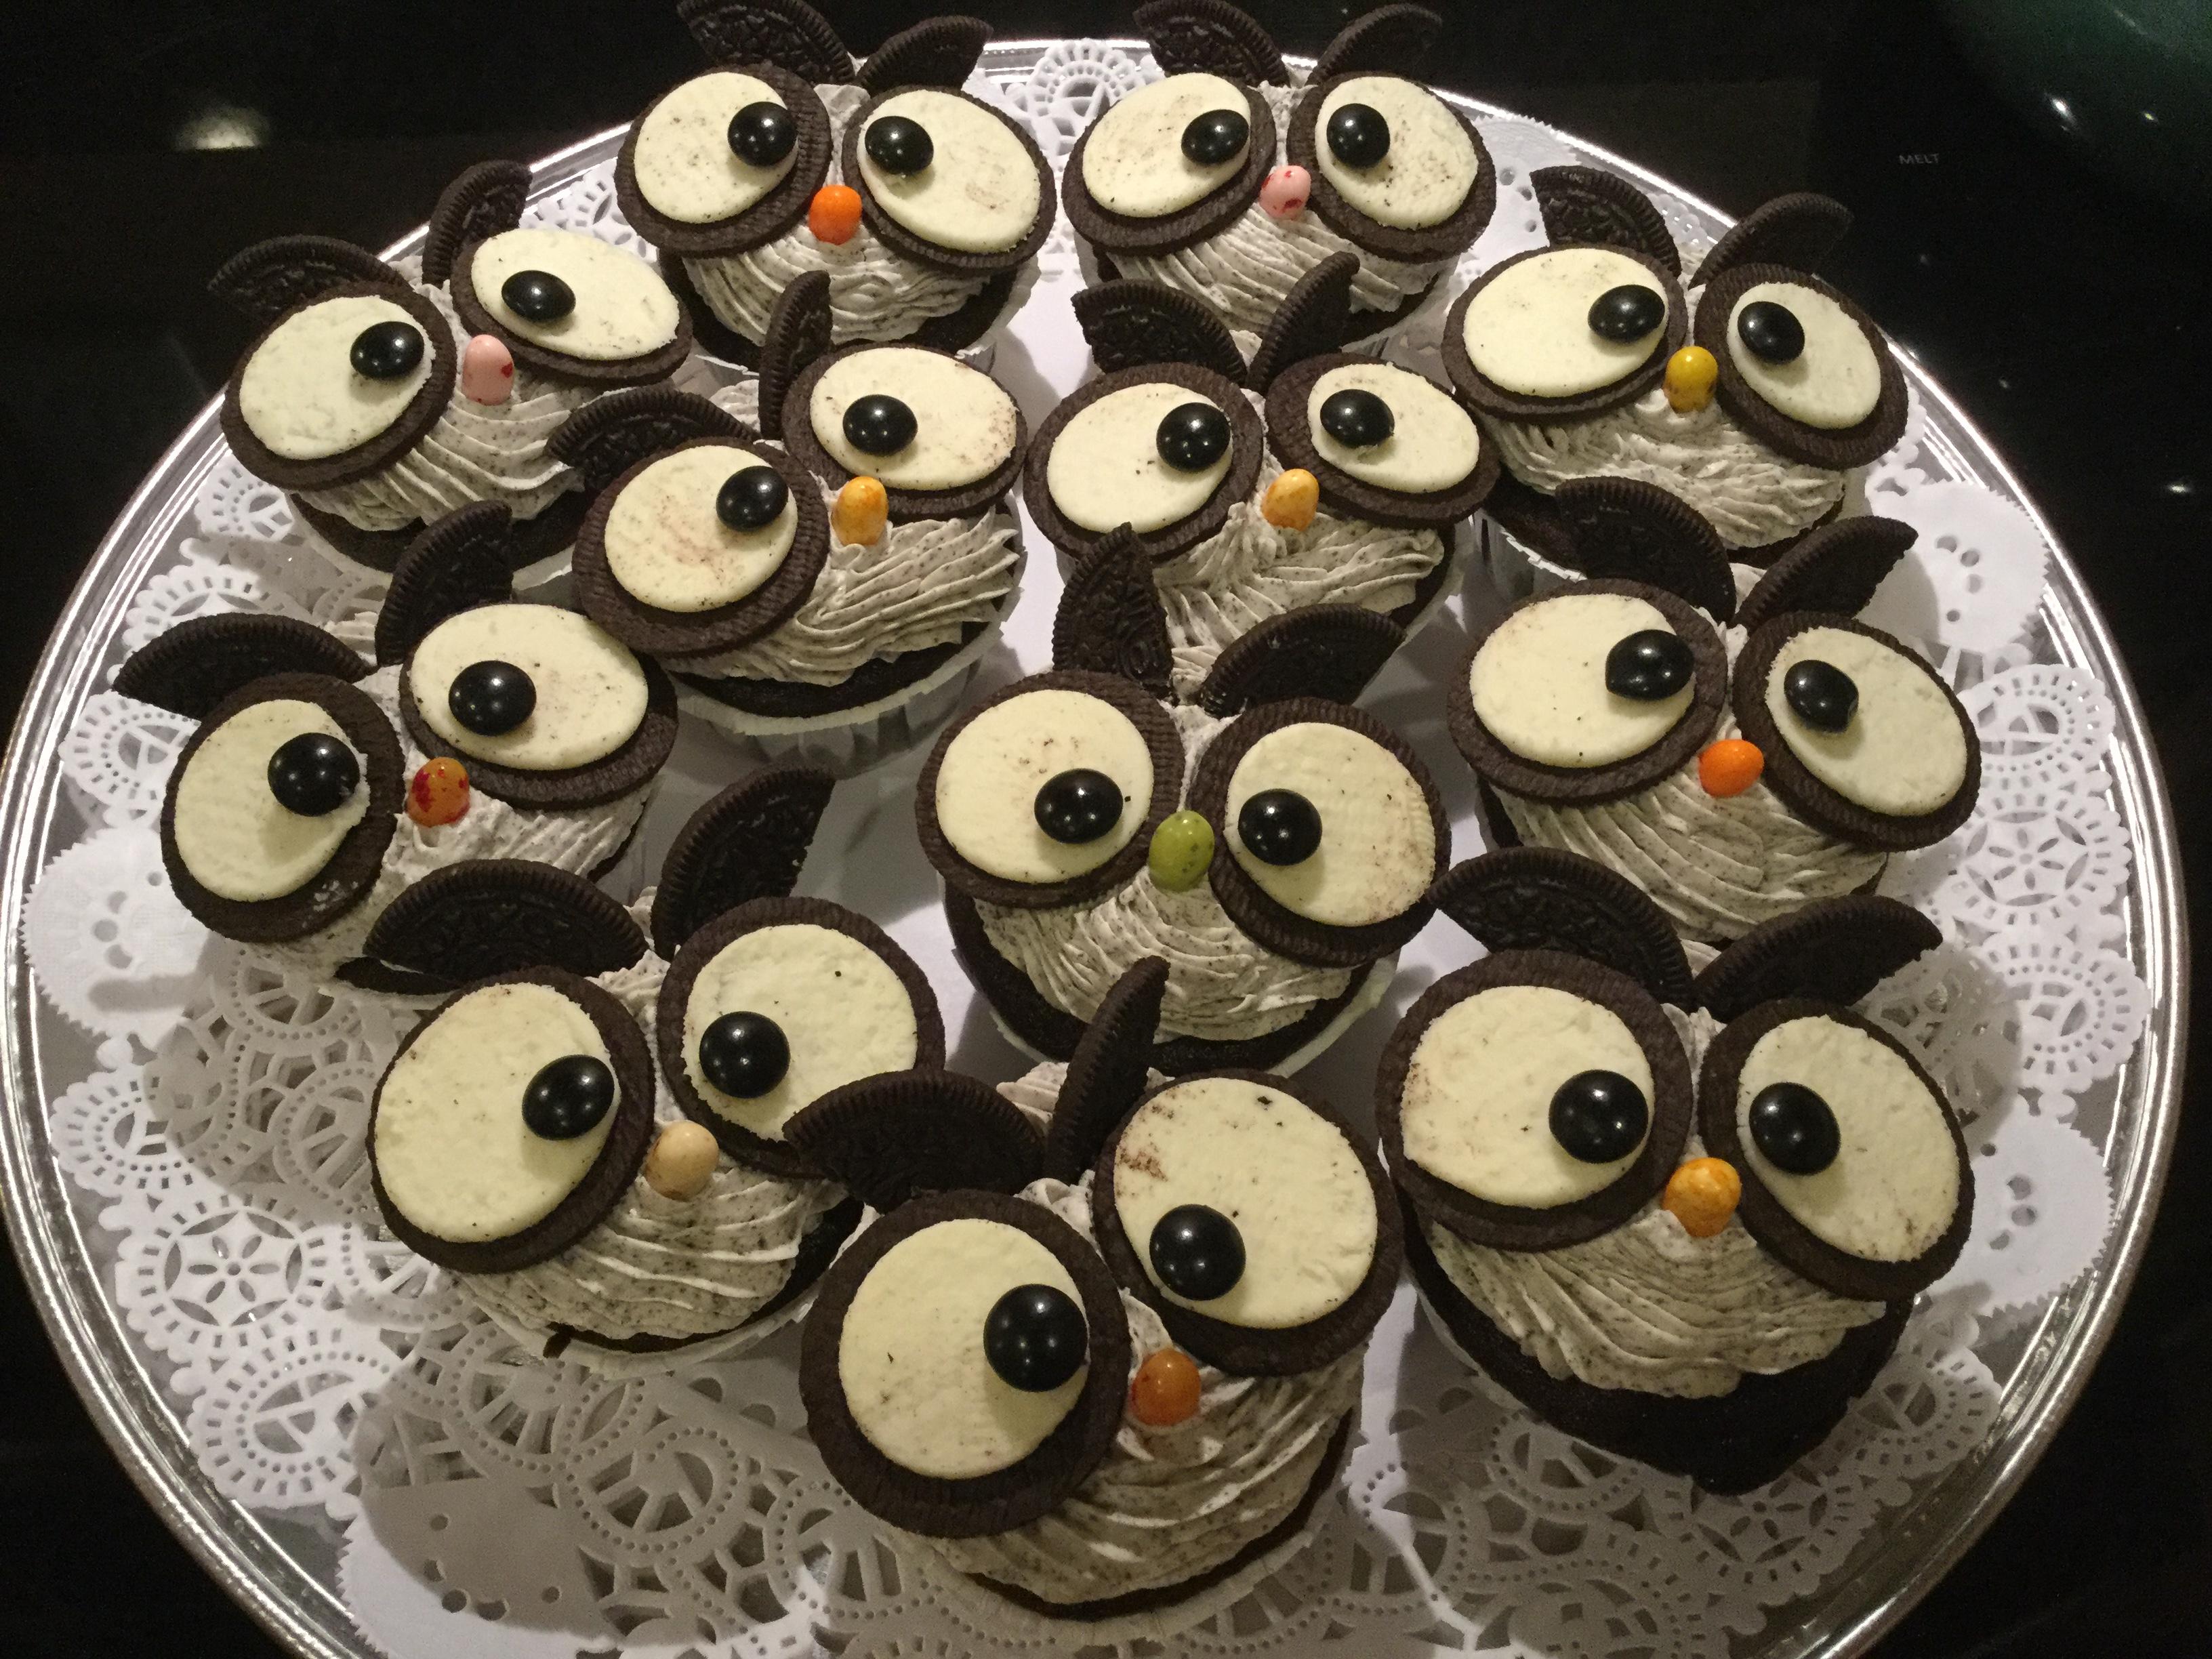 Whooo's looking at you cupcakes